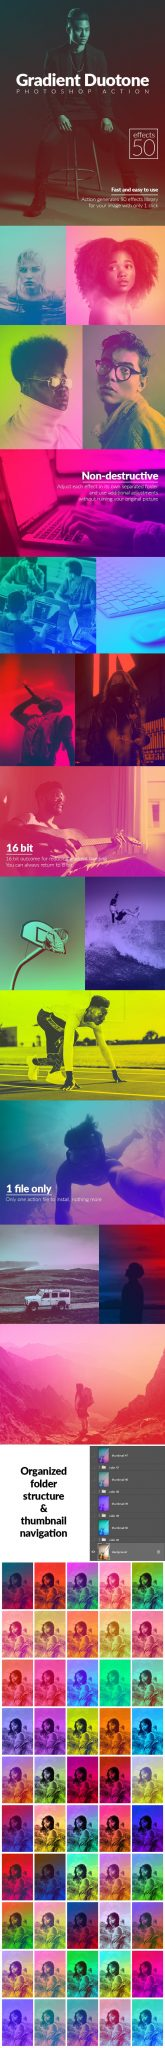 دانلود 50 اکشن فتوشاپ بنام Gradient Duotone Effects Photoshop Action